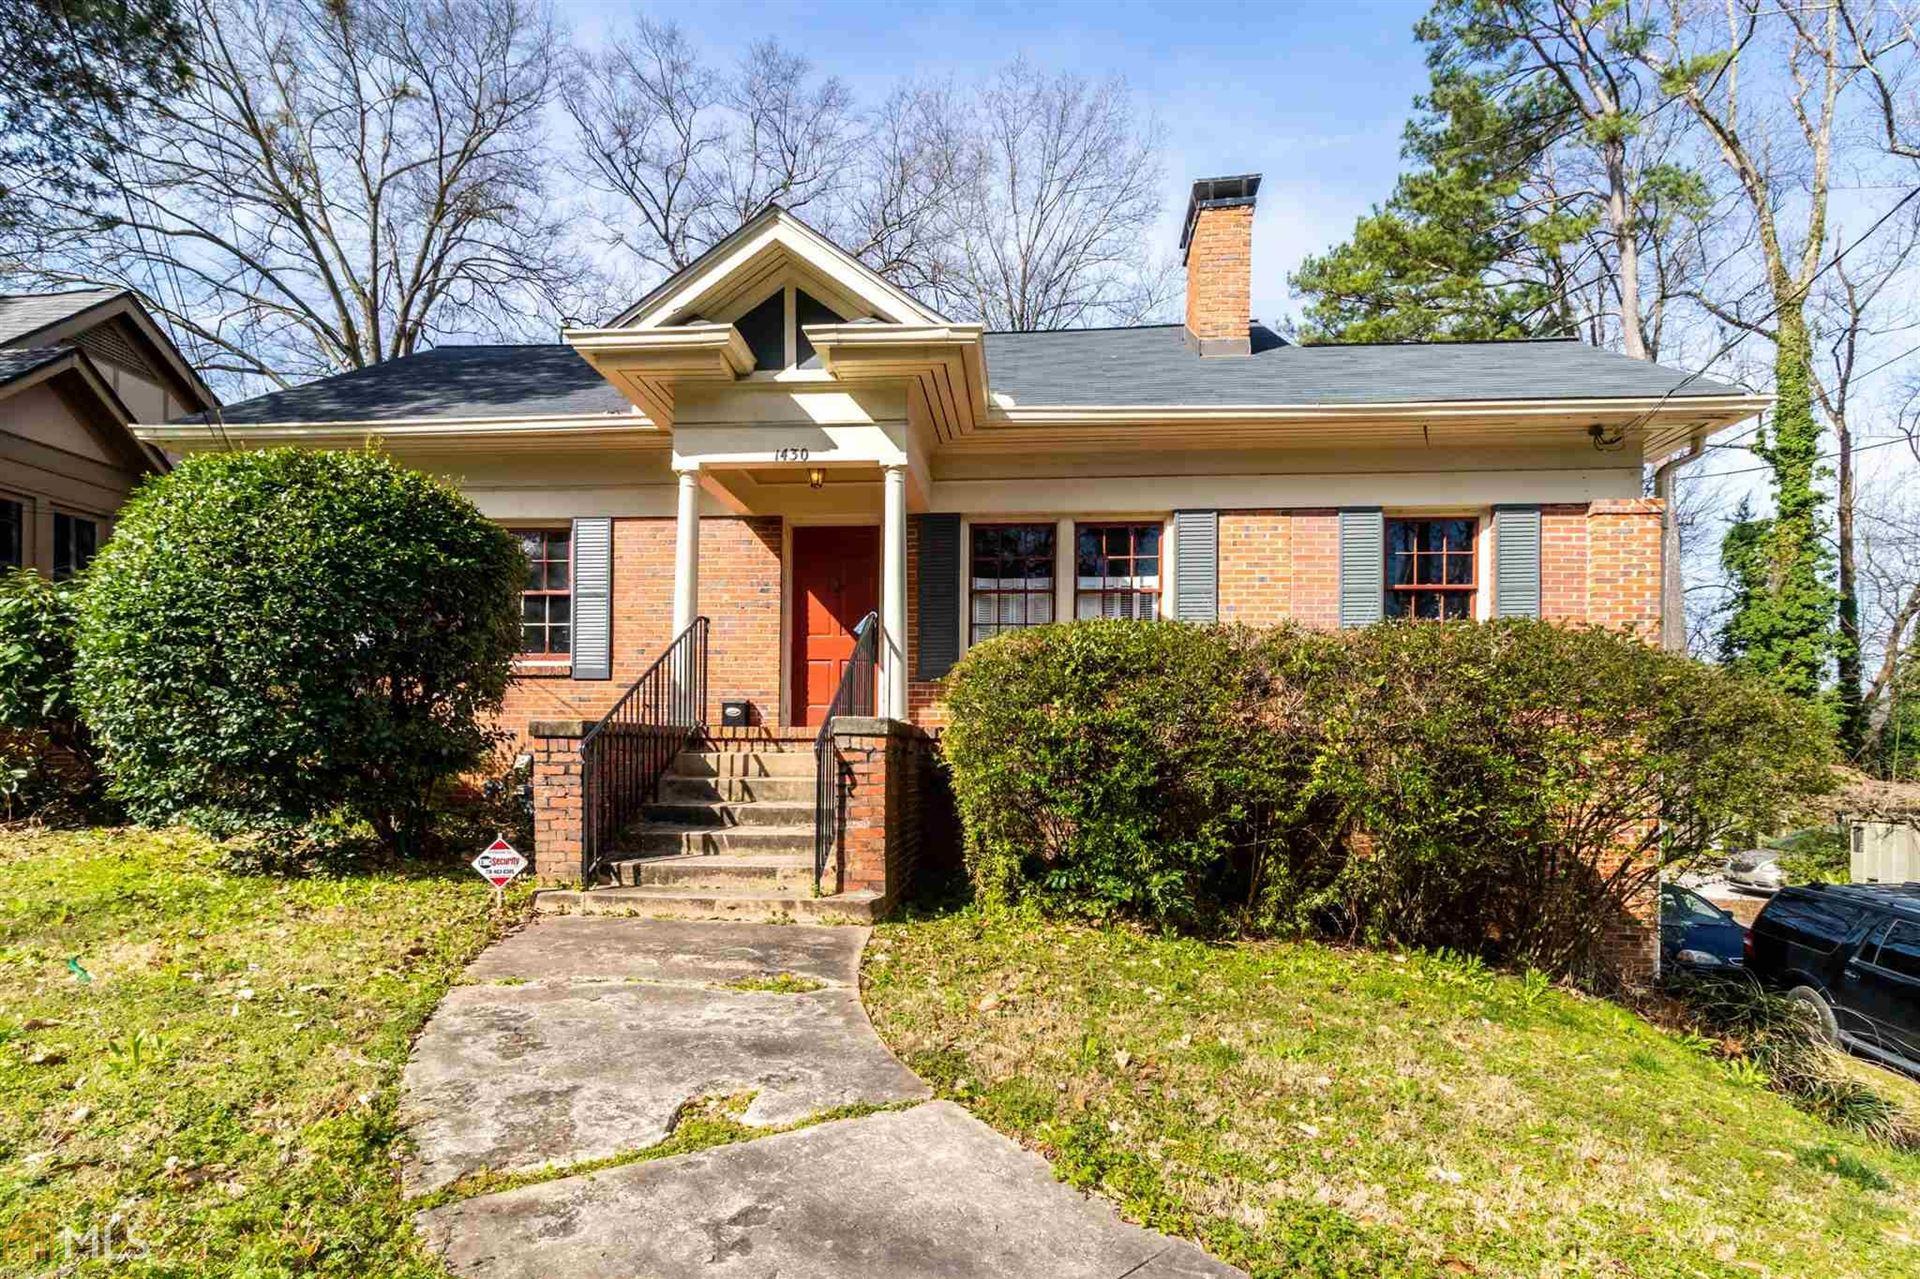 1430 Monroe Dr, Atlanta, GA 30324 - #: 8817074